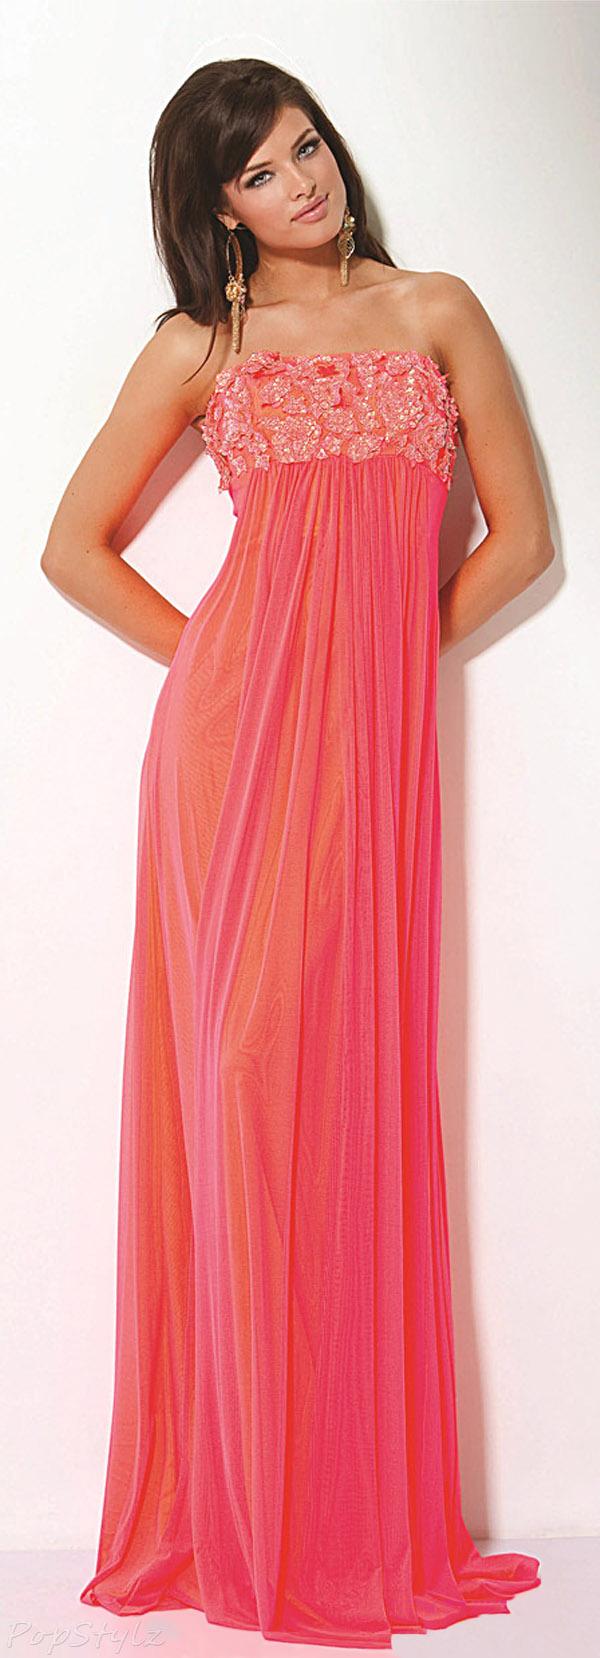 Jovani 15326 Sweet Long Formal Dress